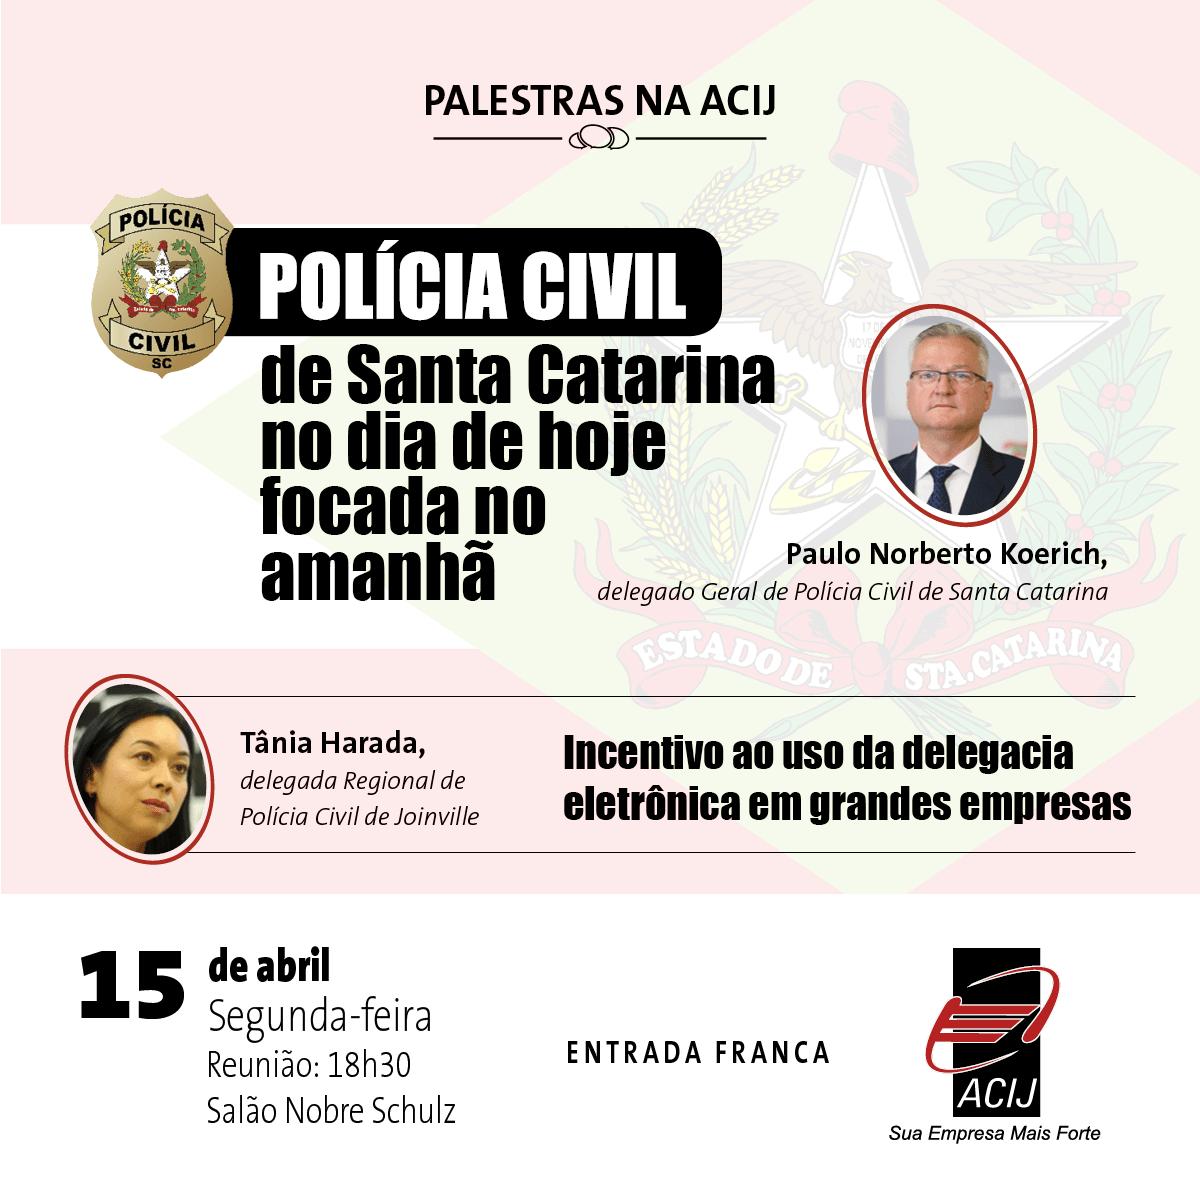 palestra-acij-policia-civil-santa-catarina-focada-no-amanha-website